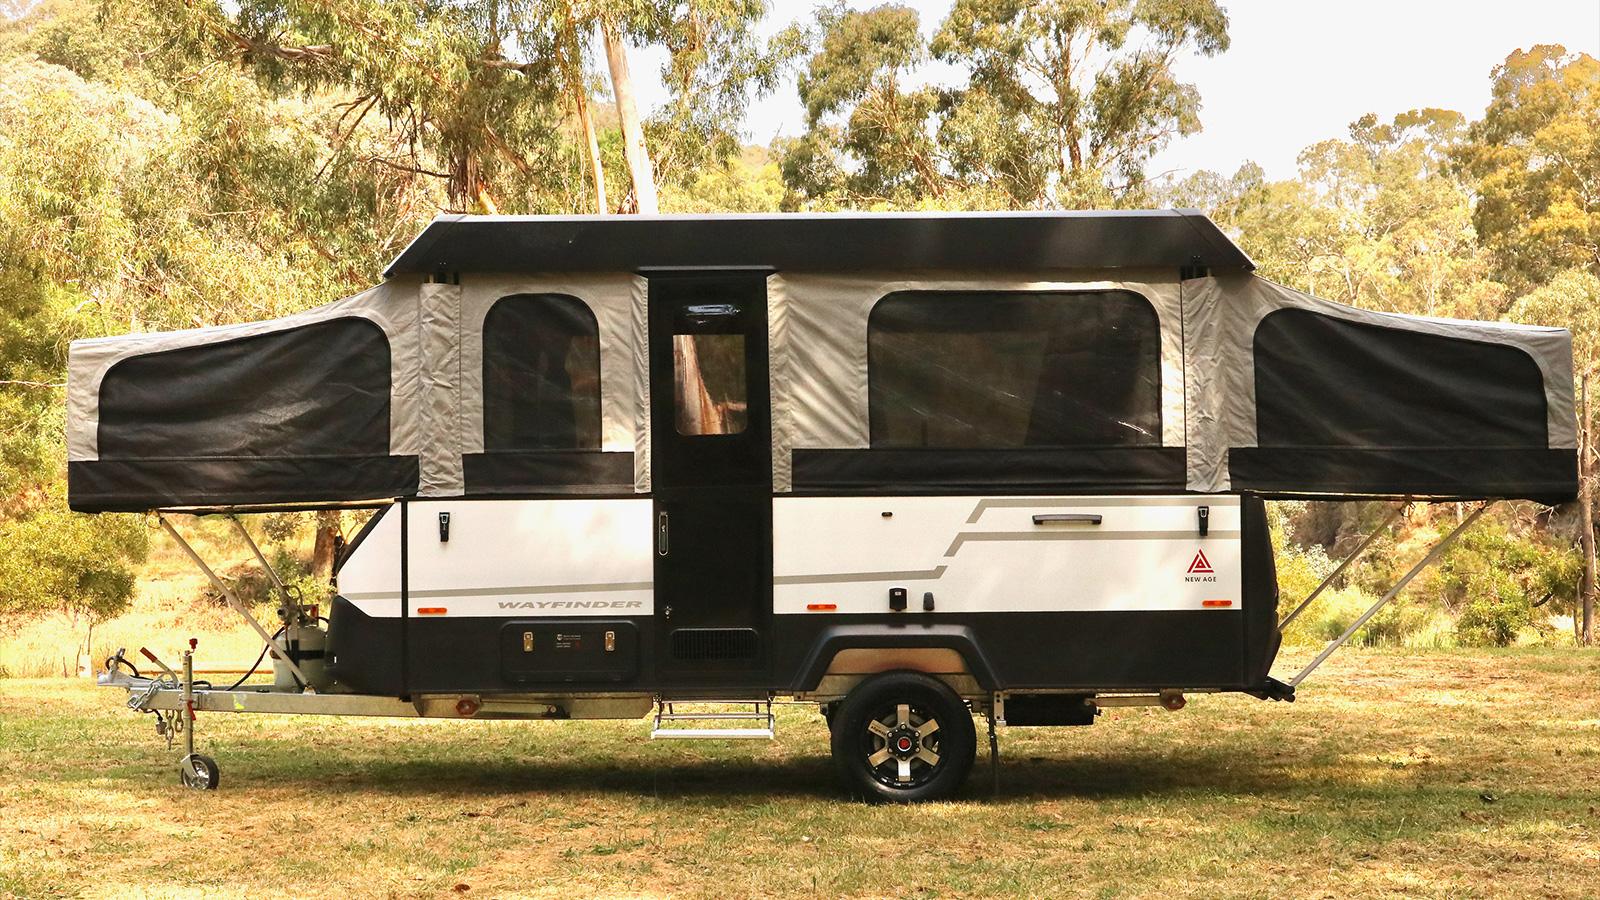 New Age Caravans MY20 Wayfinder.